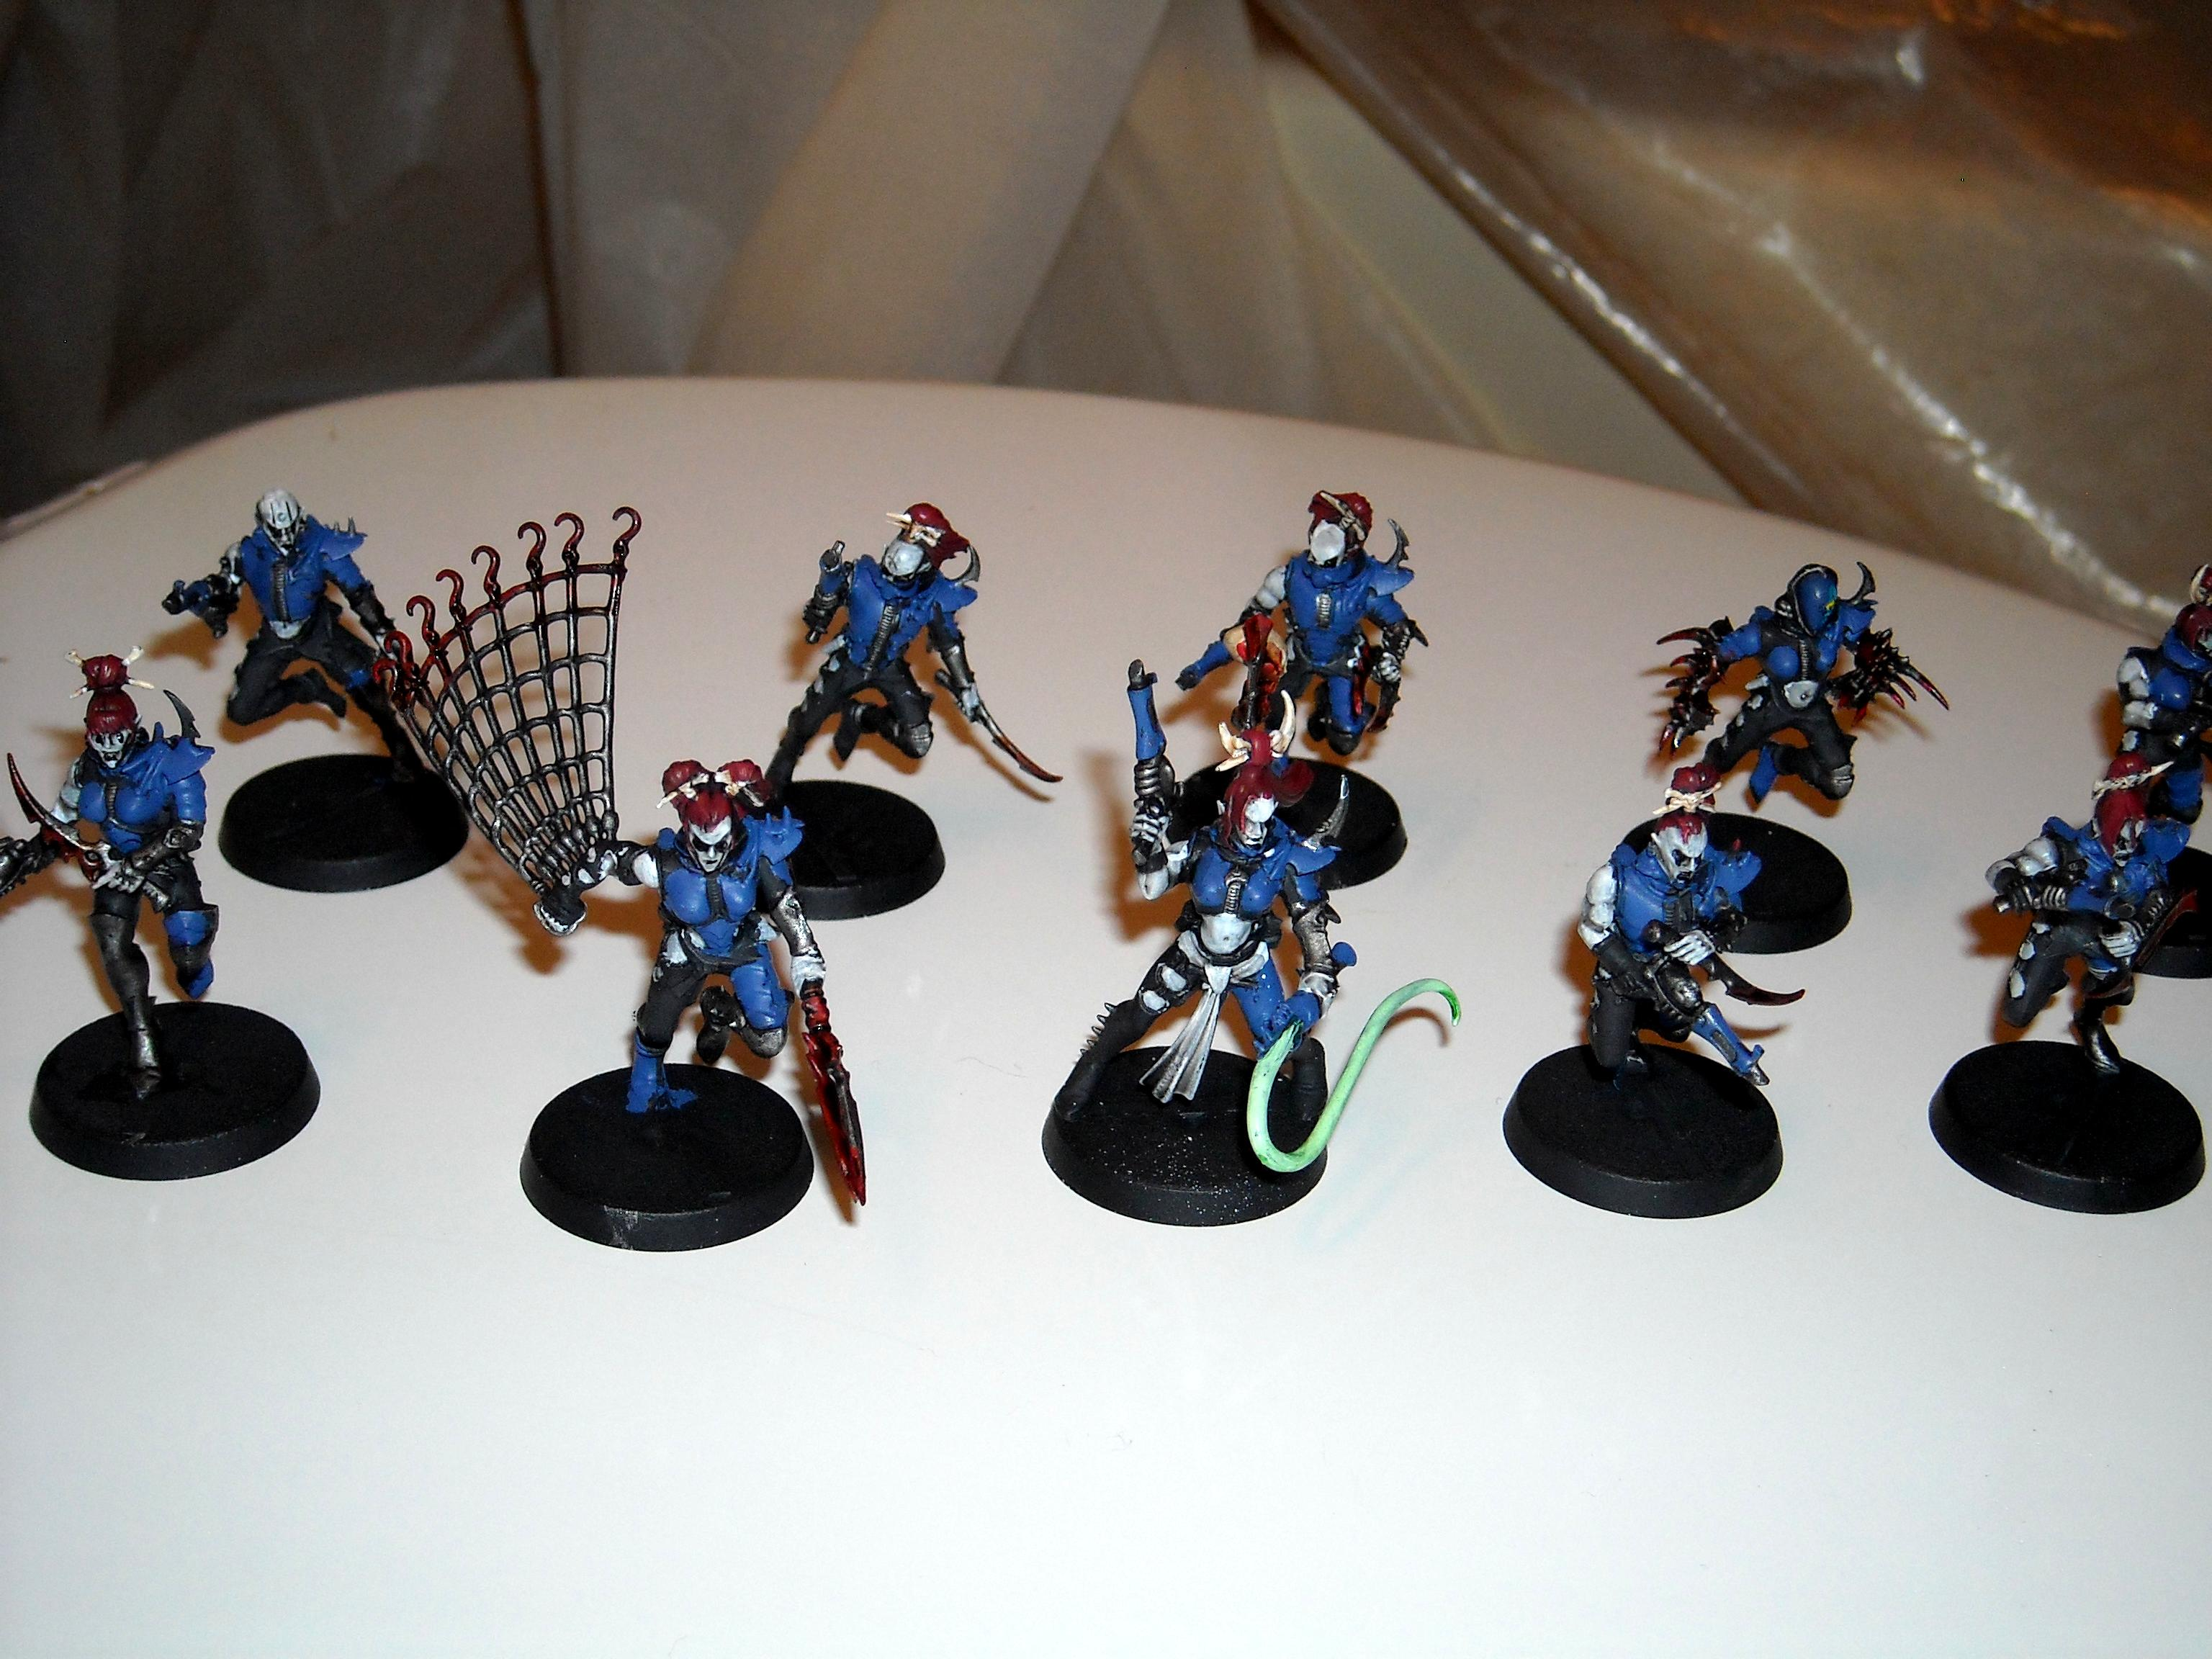 Archon, Hellions, Raider, Warriors, Wych, Wyches